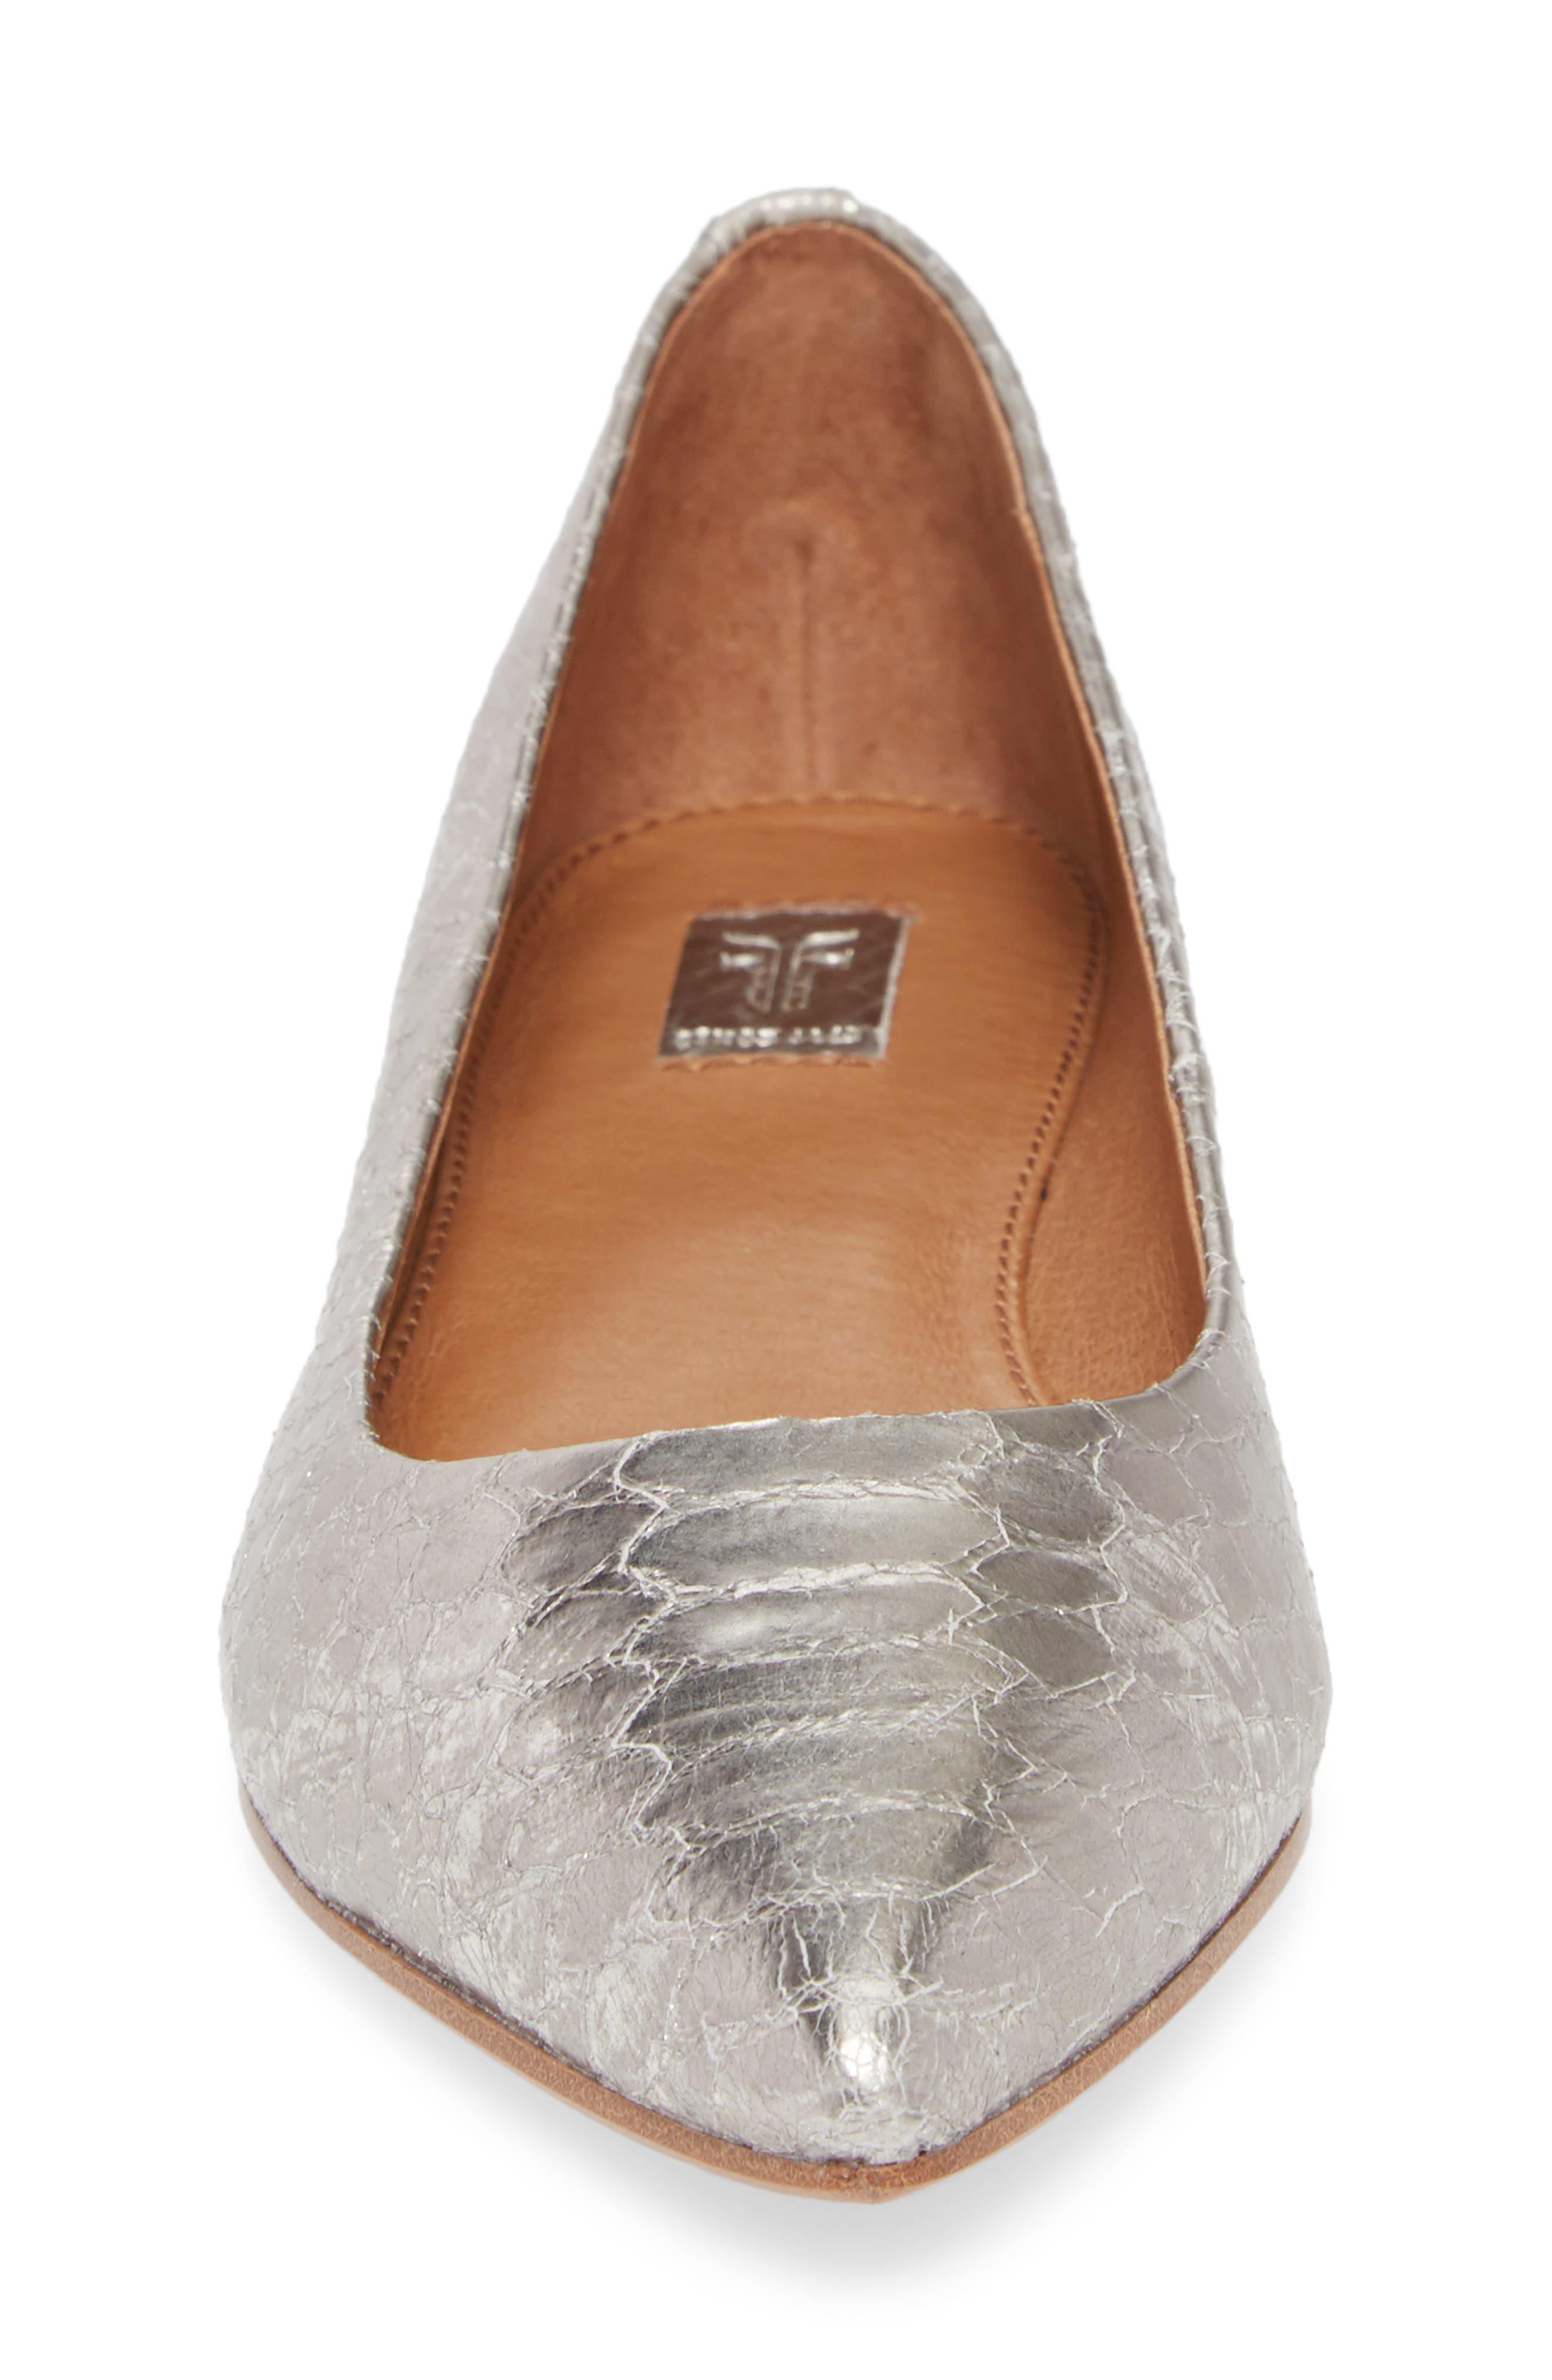 Sienna Pointy Toe Ballet Flat,                             Alternate thumbnail 10, color,